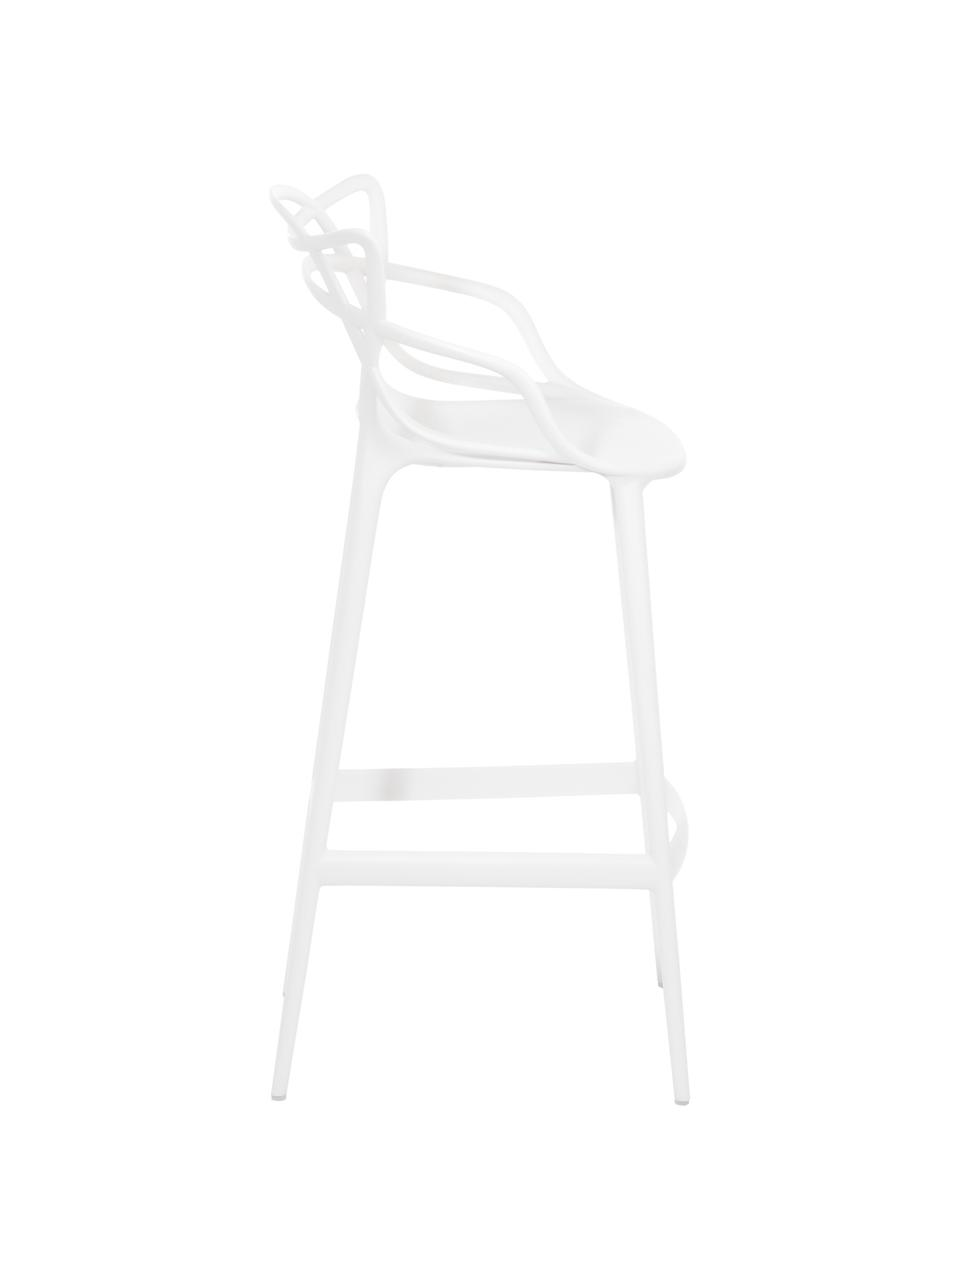 Barstuhl Masters, Polypropylen, Weiß, 49 x 109 cm